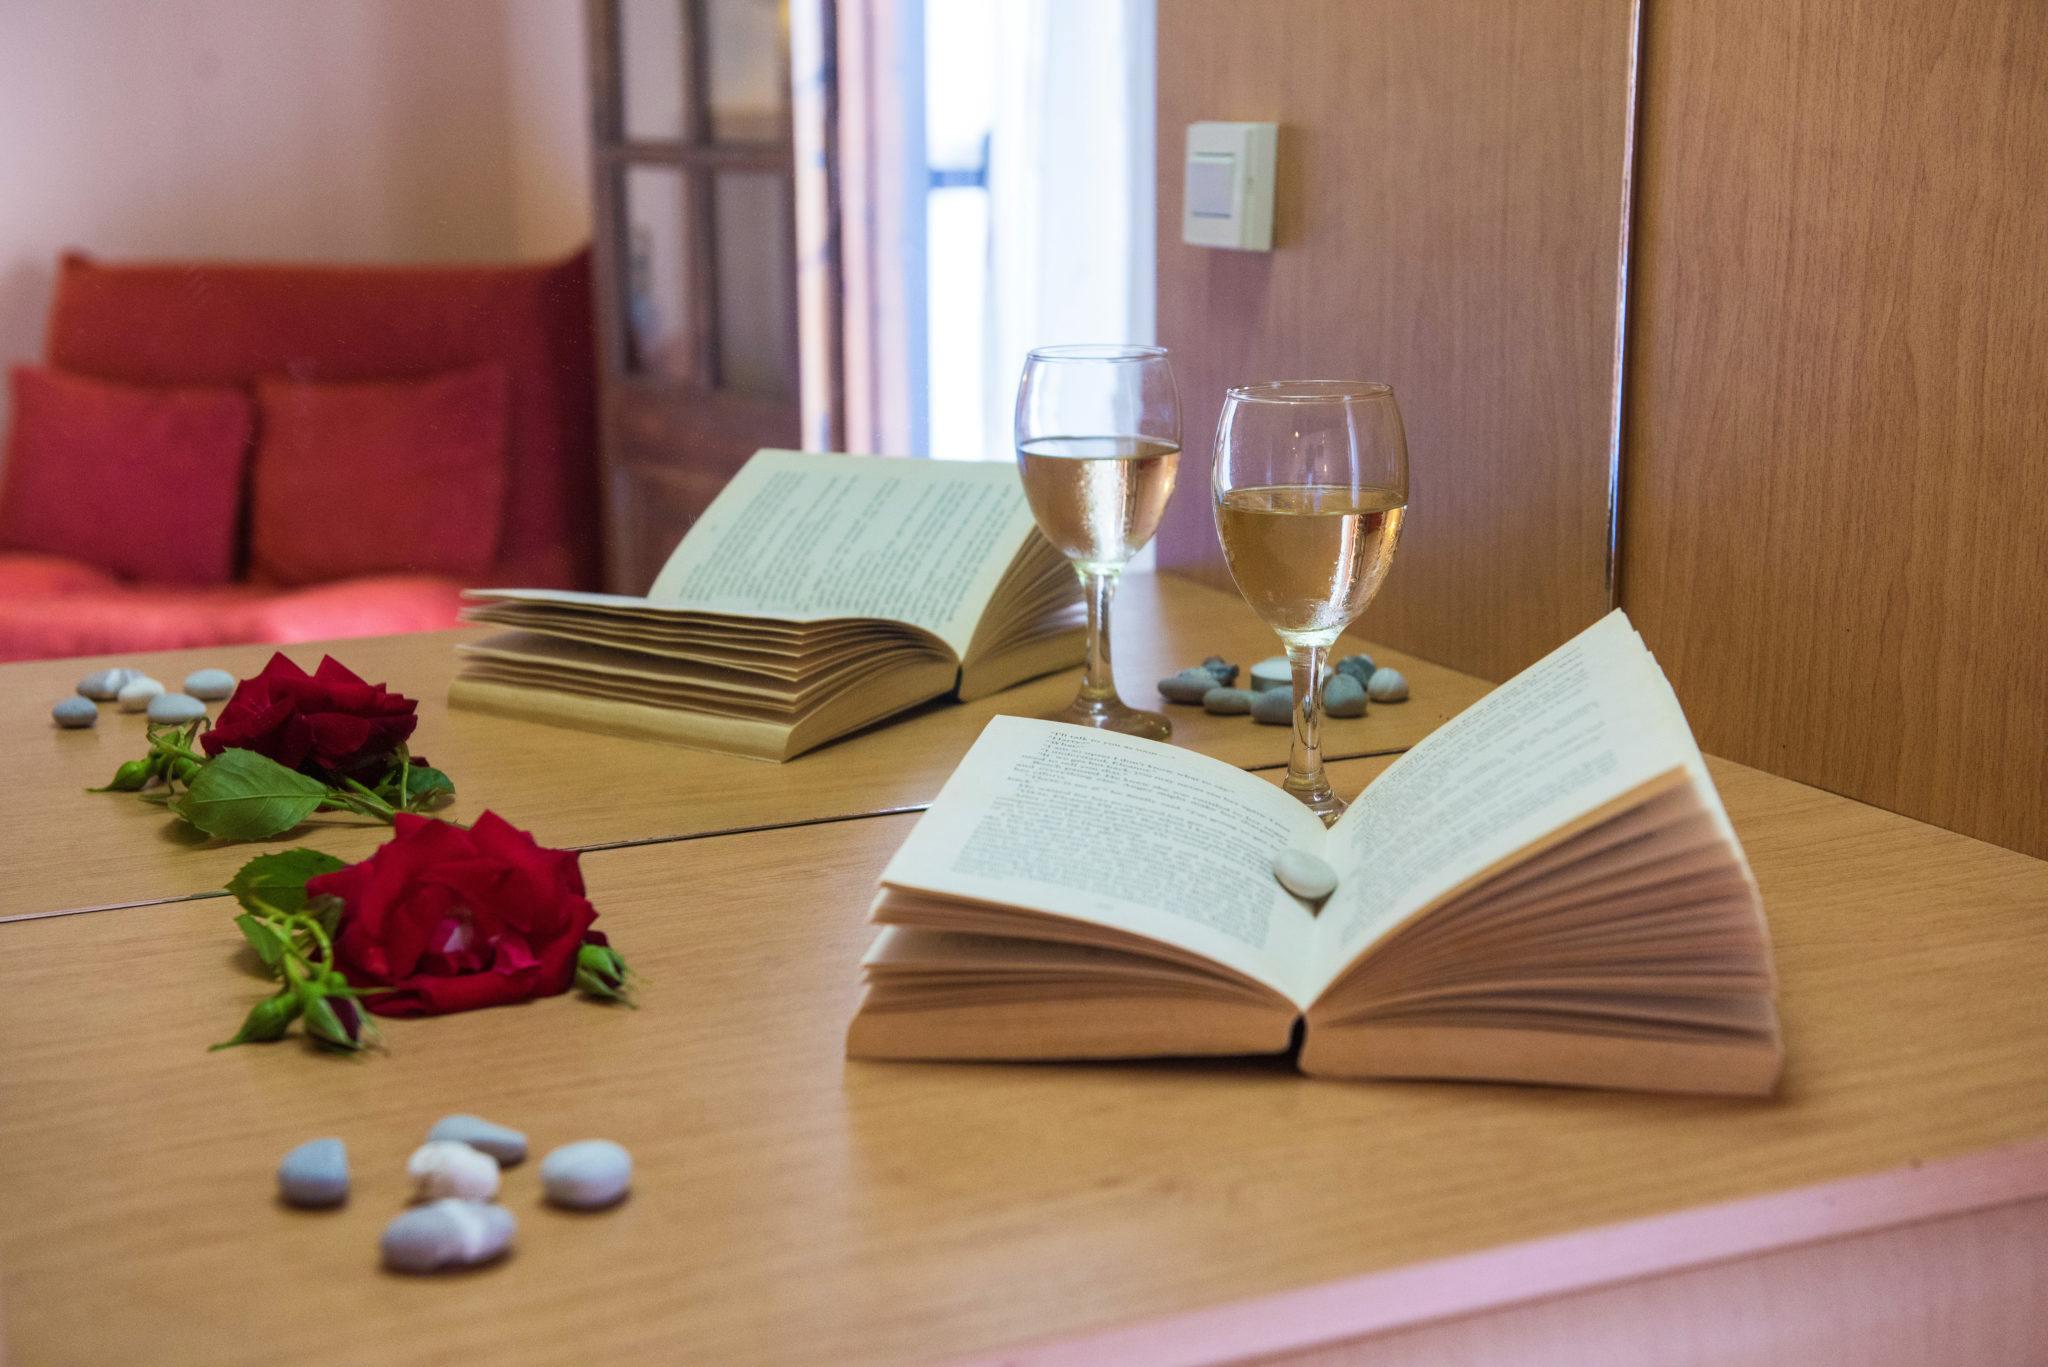 dominoes standart poolside triple room - cheap accommodation ipsos corfu